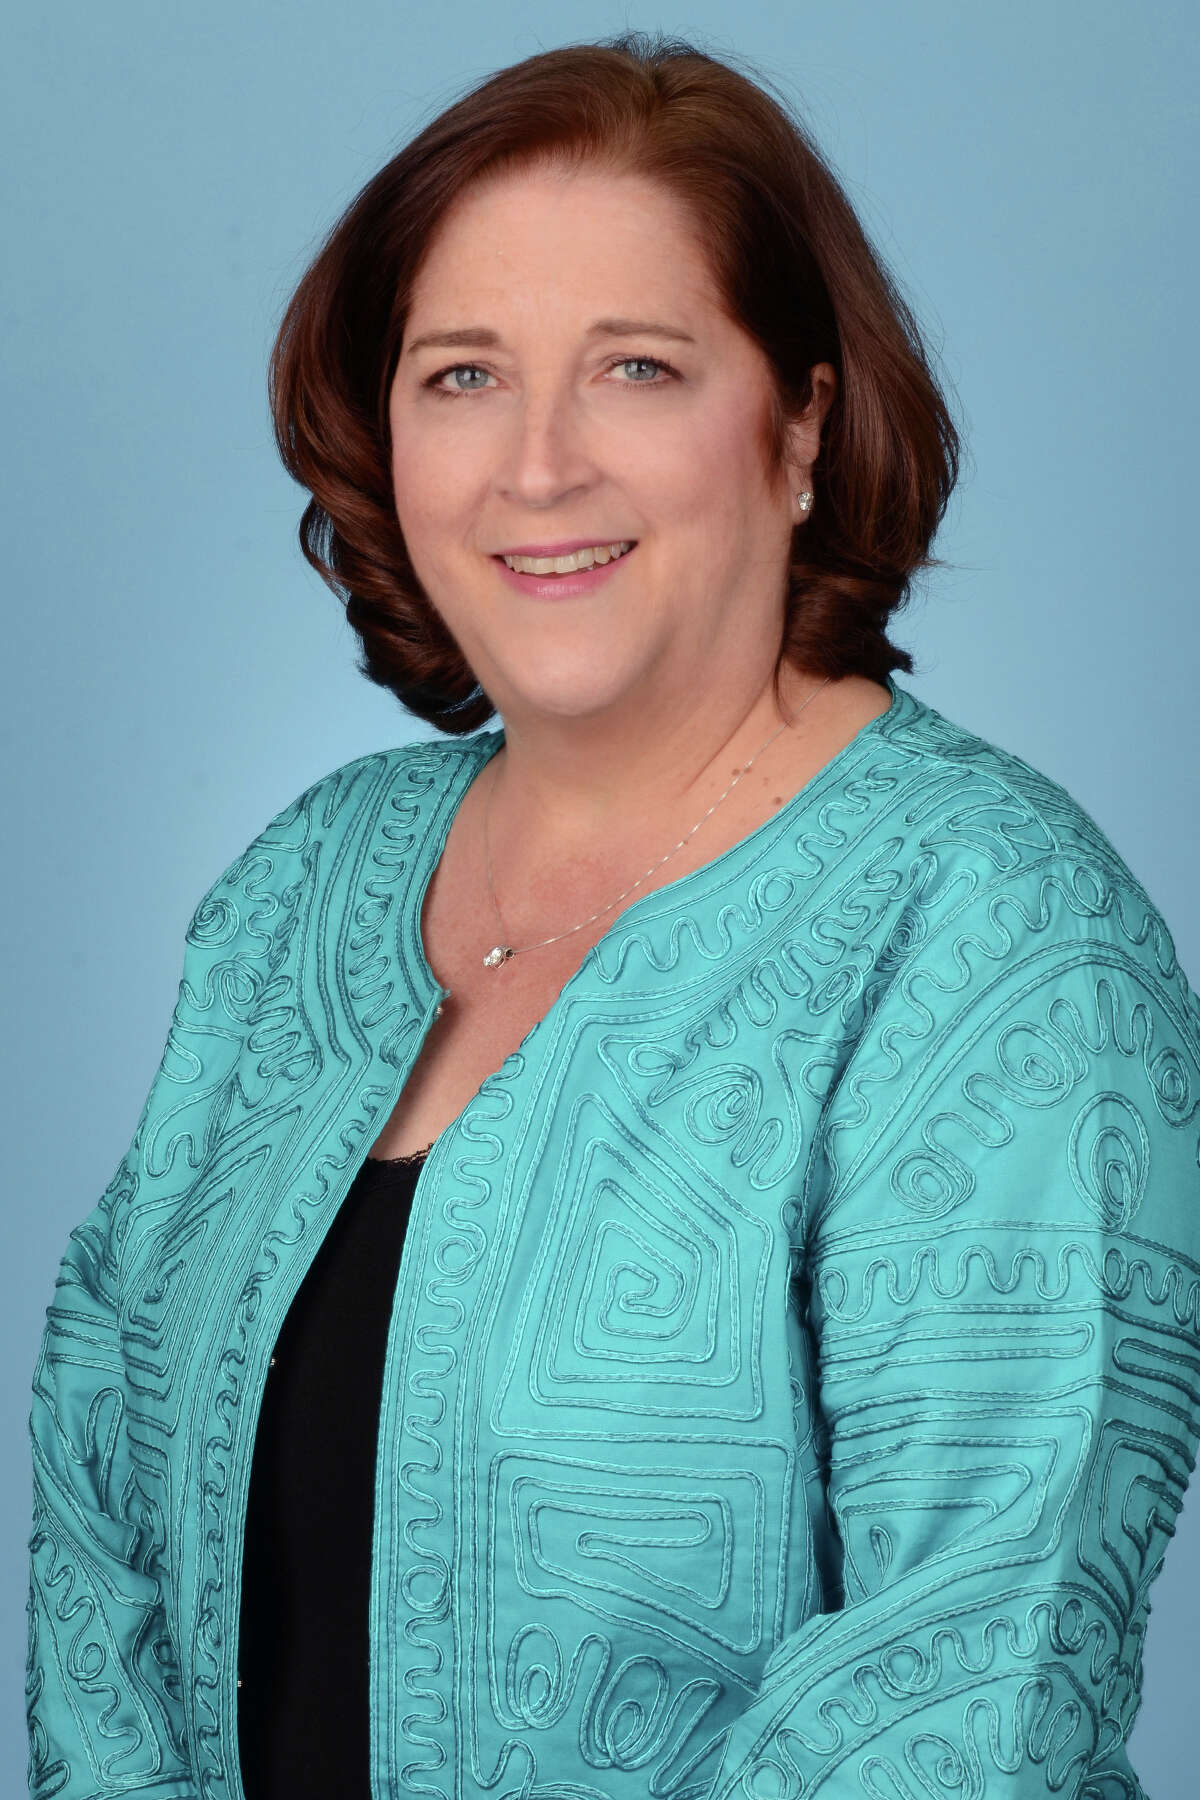 Kari Hough has been named principal of Tipps Elementary School.